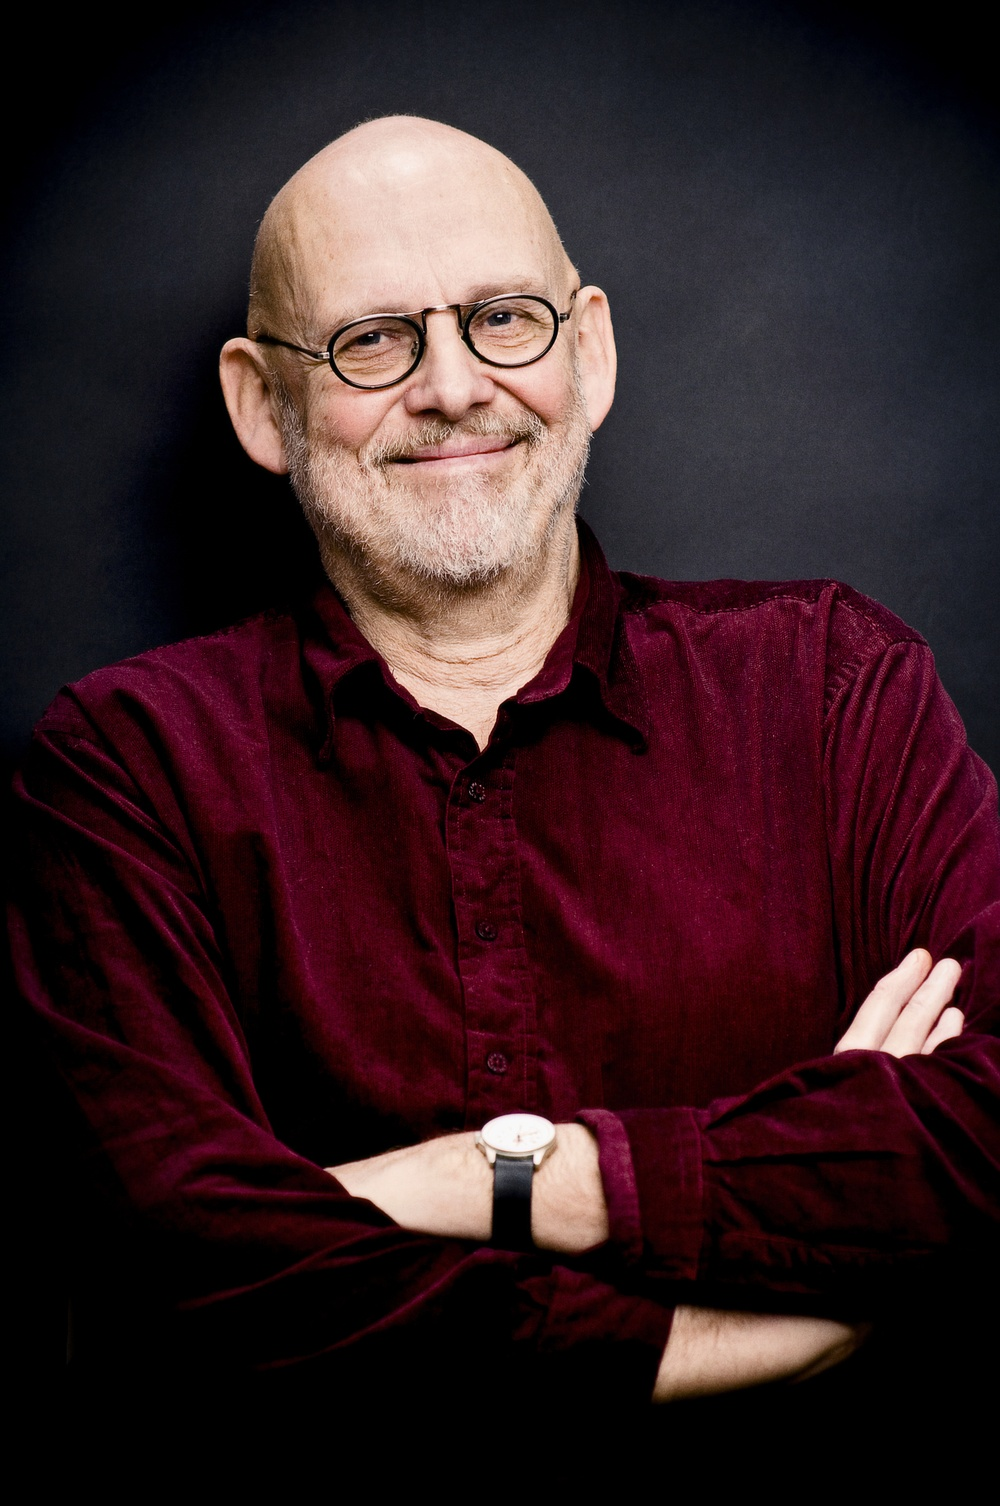 Jan Lööf årets Knut V Pettersson-stipendiat. Foto: Stefan Tell